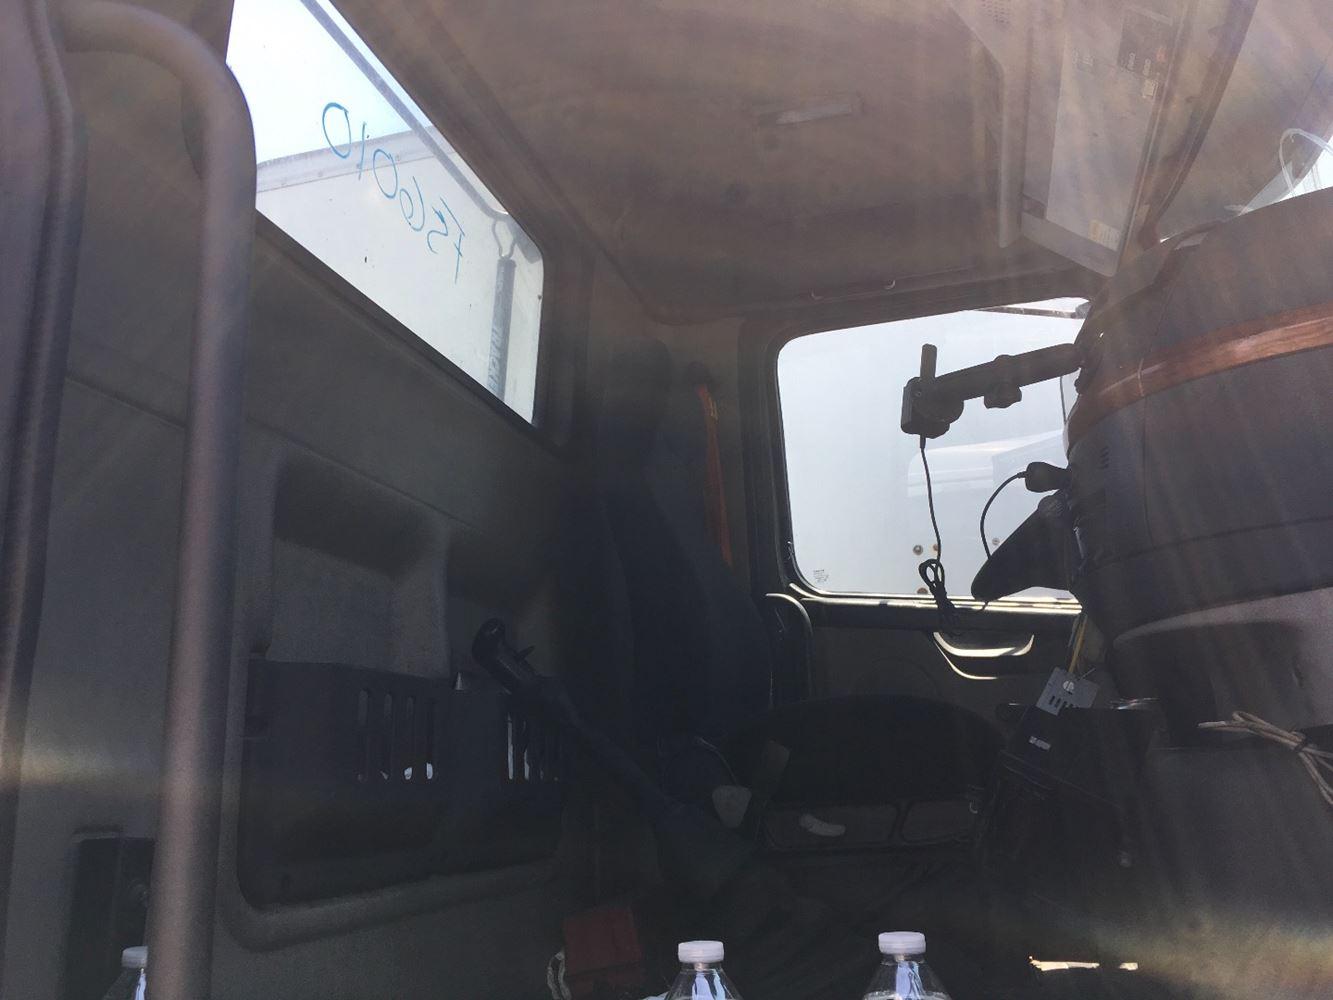 2006 VOLVO VNM CAB TRUCK PARTS #686115